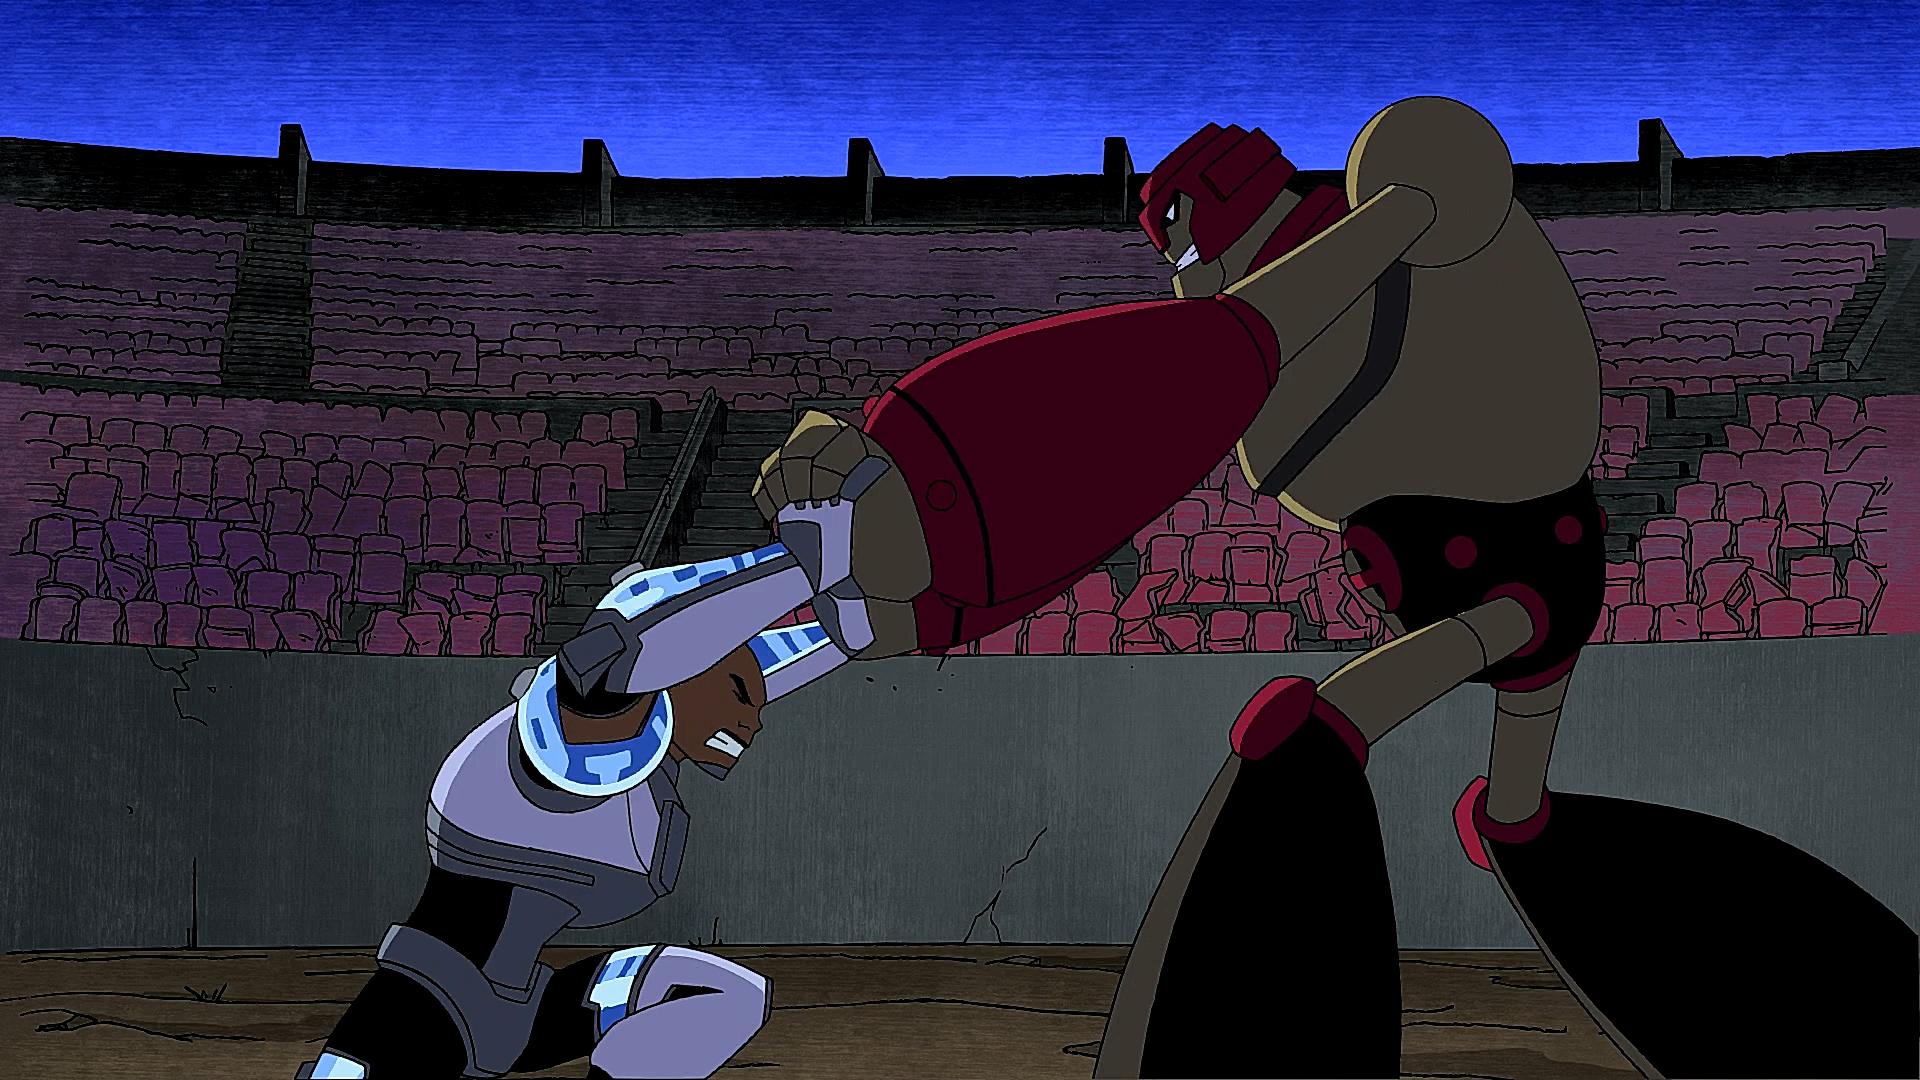 Teen Titans (TV Series) Episode: Only Human